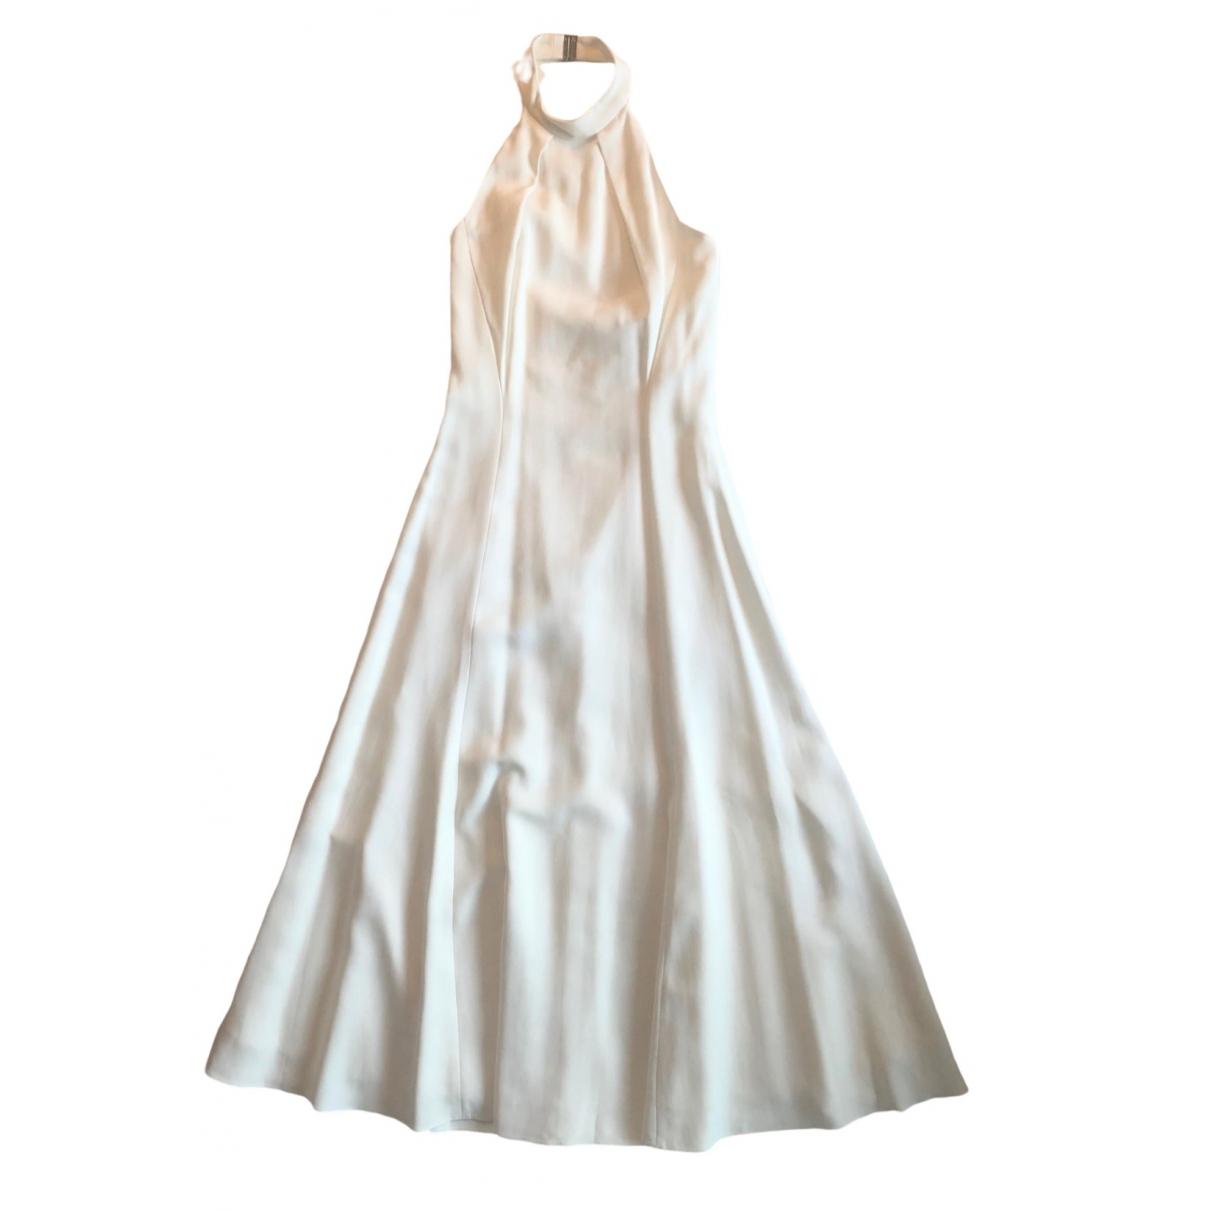 Karen Millen \N Kleid in  Weiss Polyester